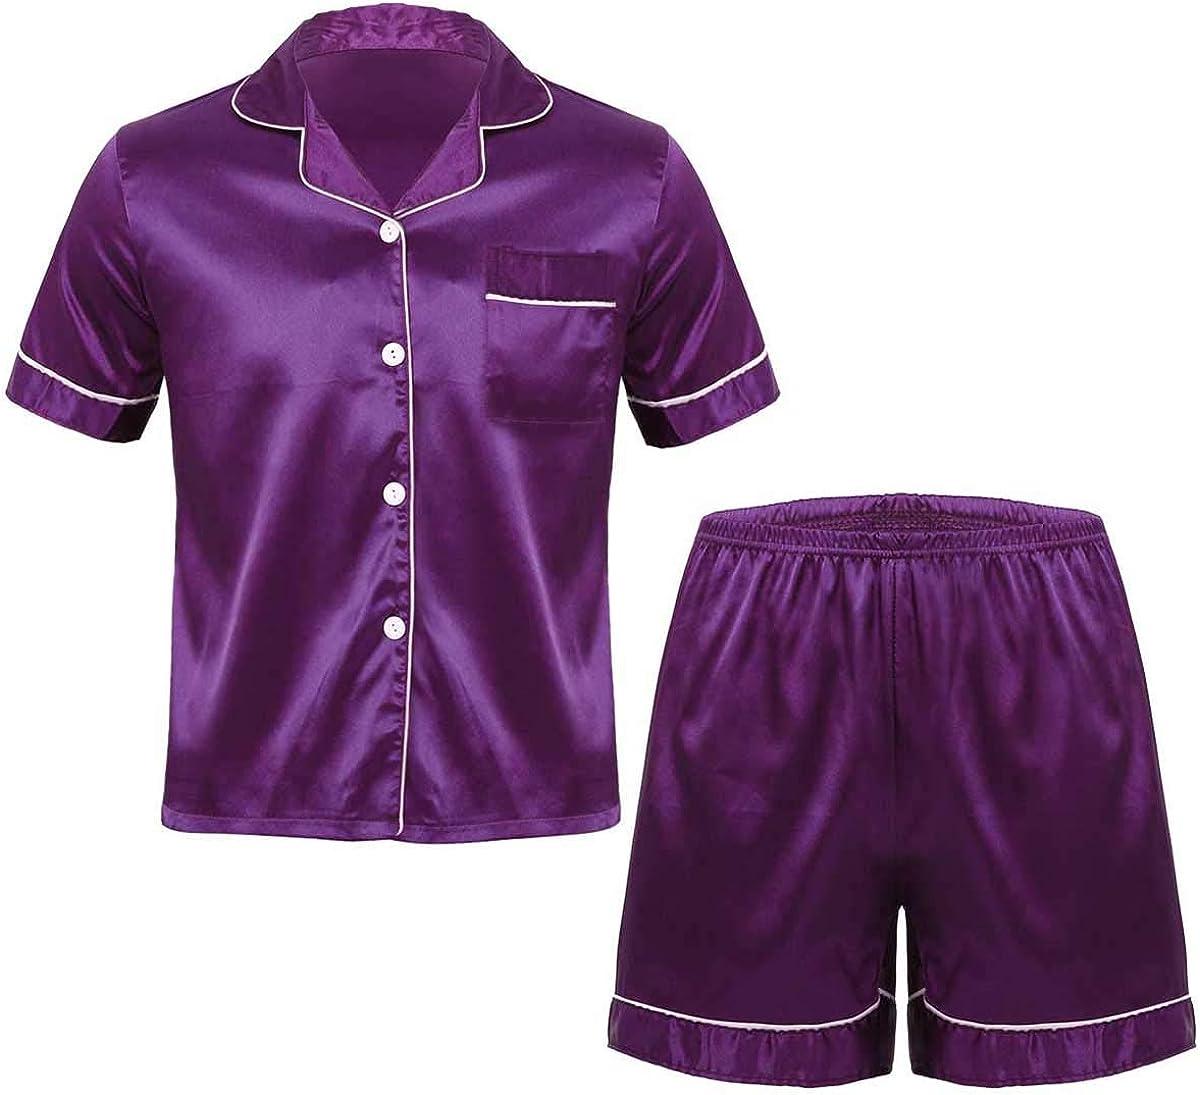 zdhoor Men's Satin Silk 2 Pieces Pajamas Set Short Sleeve Button Down Shirt Sleep Lounge Shorts Bottom